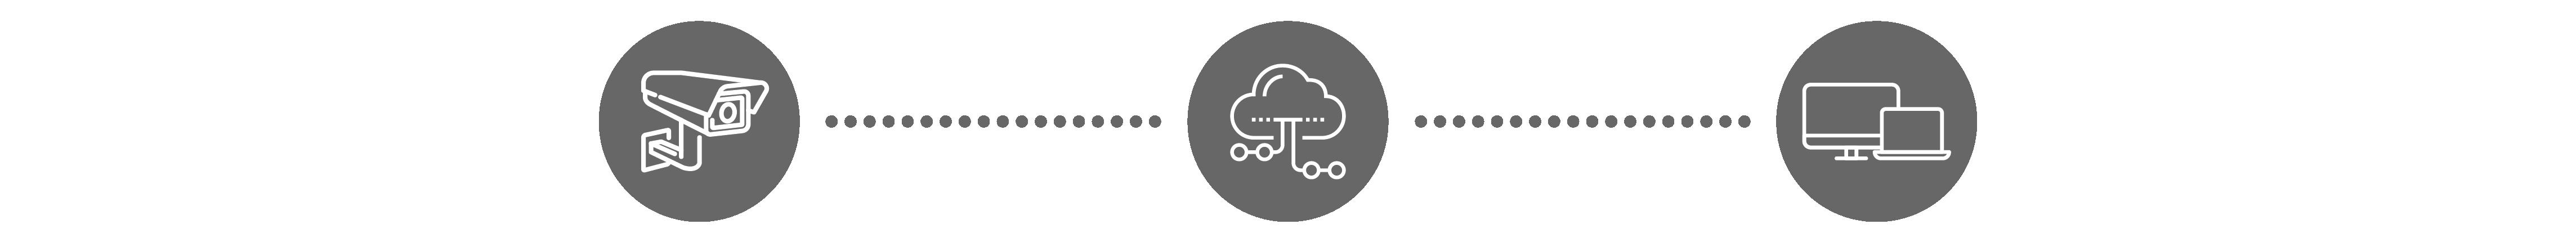 Cloud Surveillance_NEW-01-3